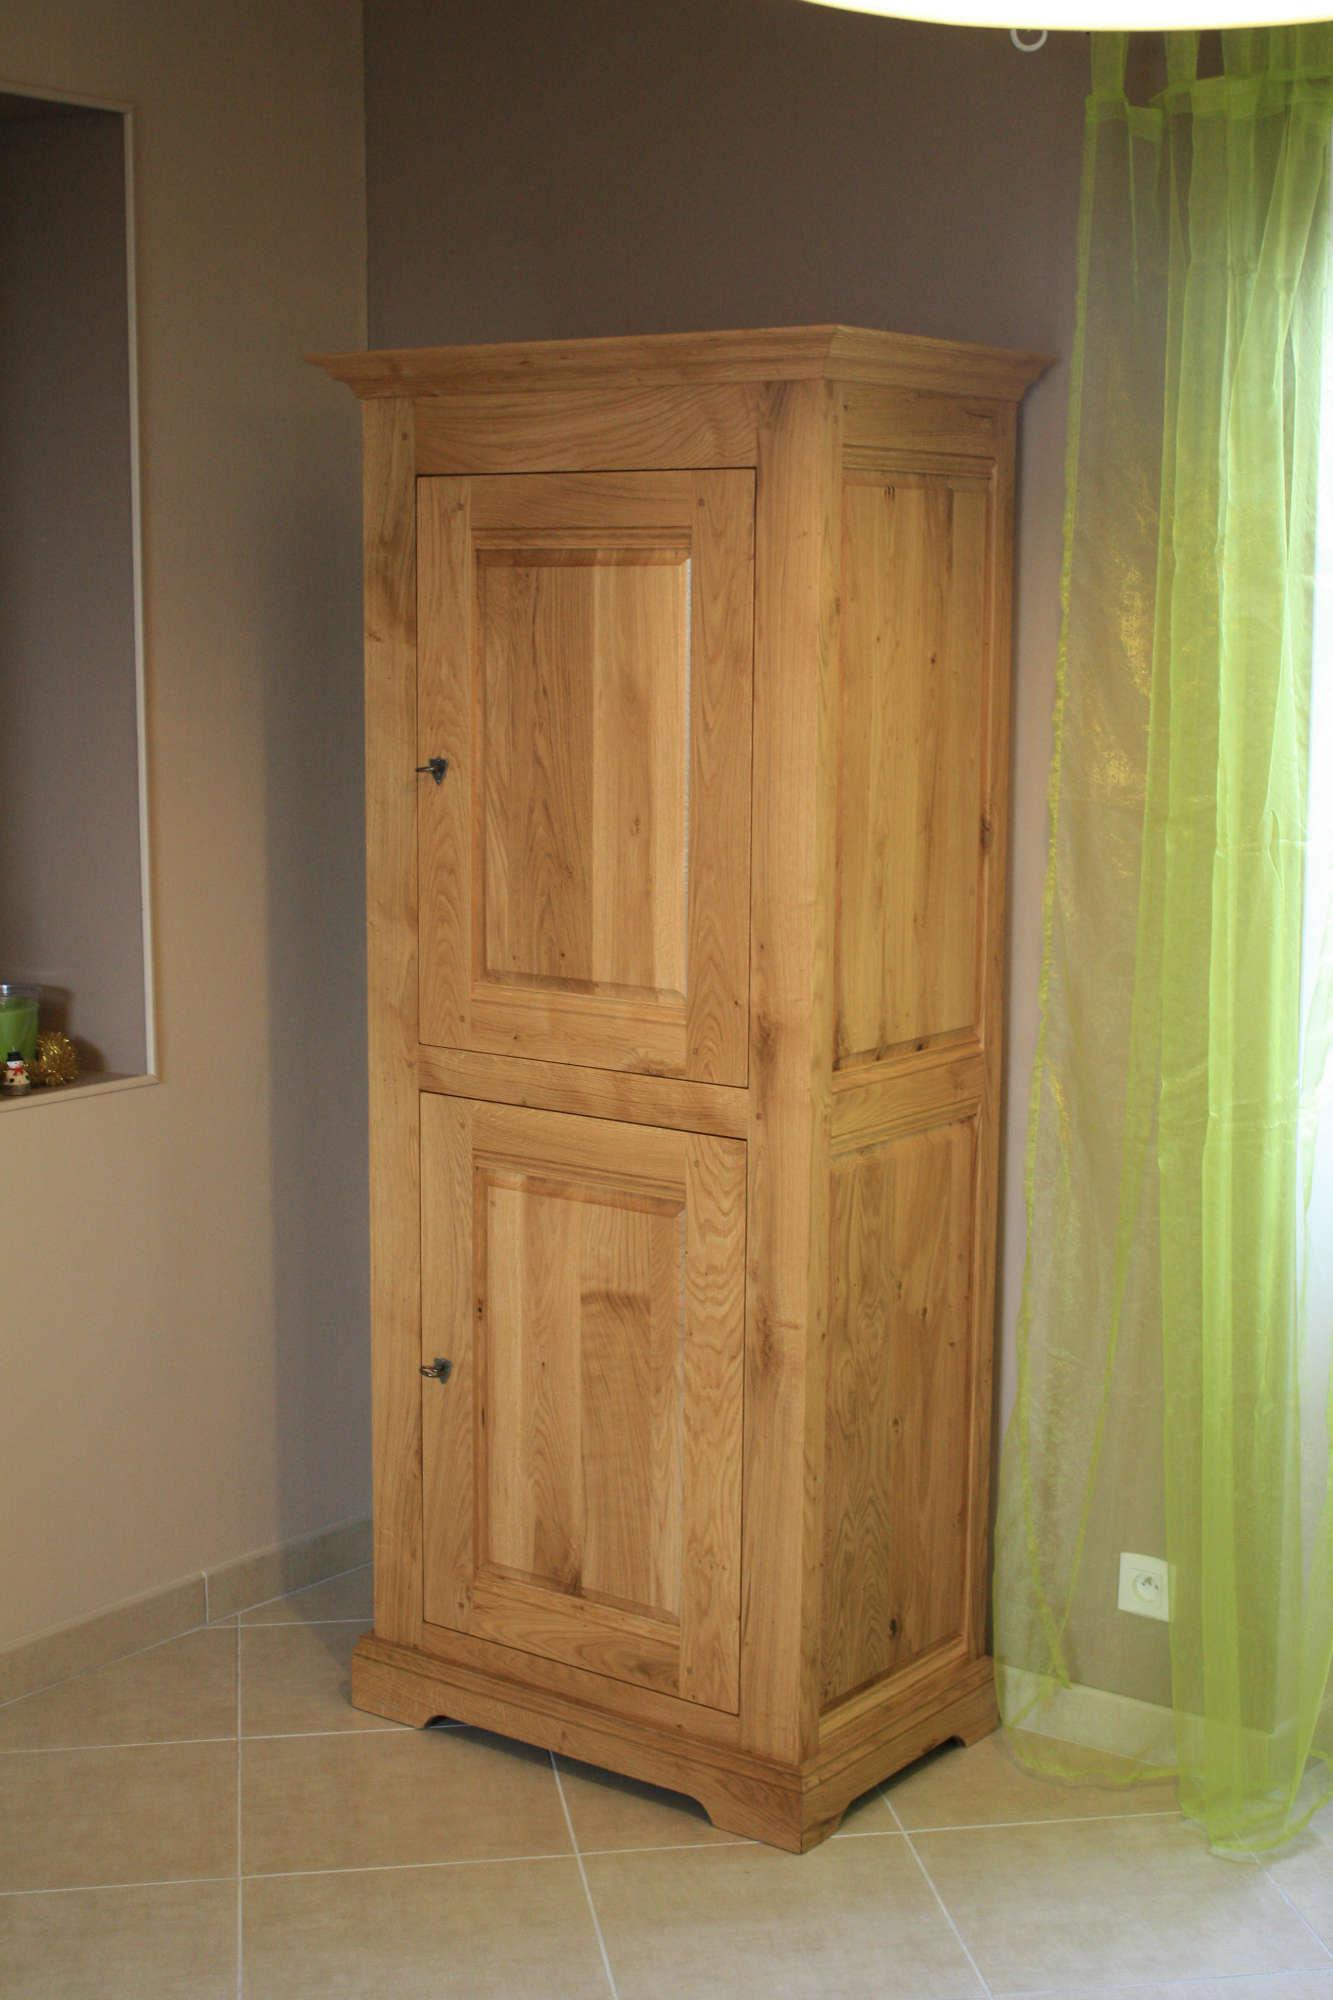 menuiserie corbigny meubles dufour bois vernis sur mesure placard. Black Bedroom Furniture Sets. Home Design Ideas